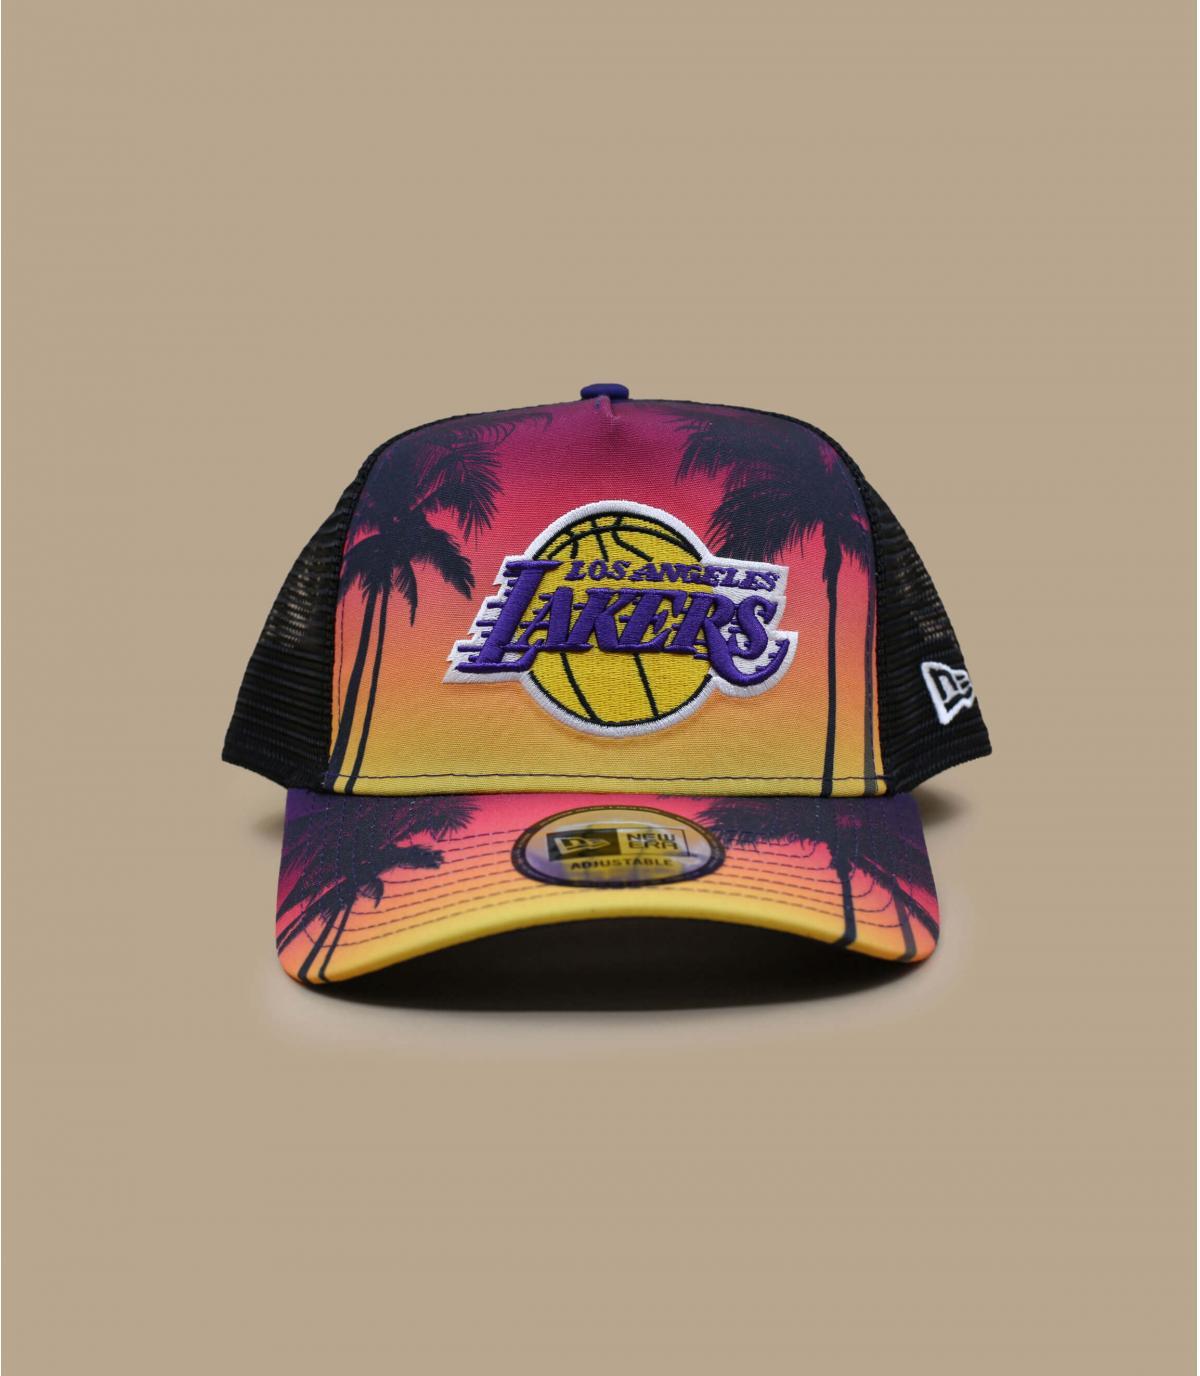 Detalles Trucker Summer City Lakers imagen 2